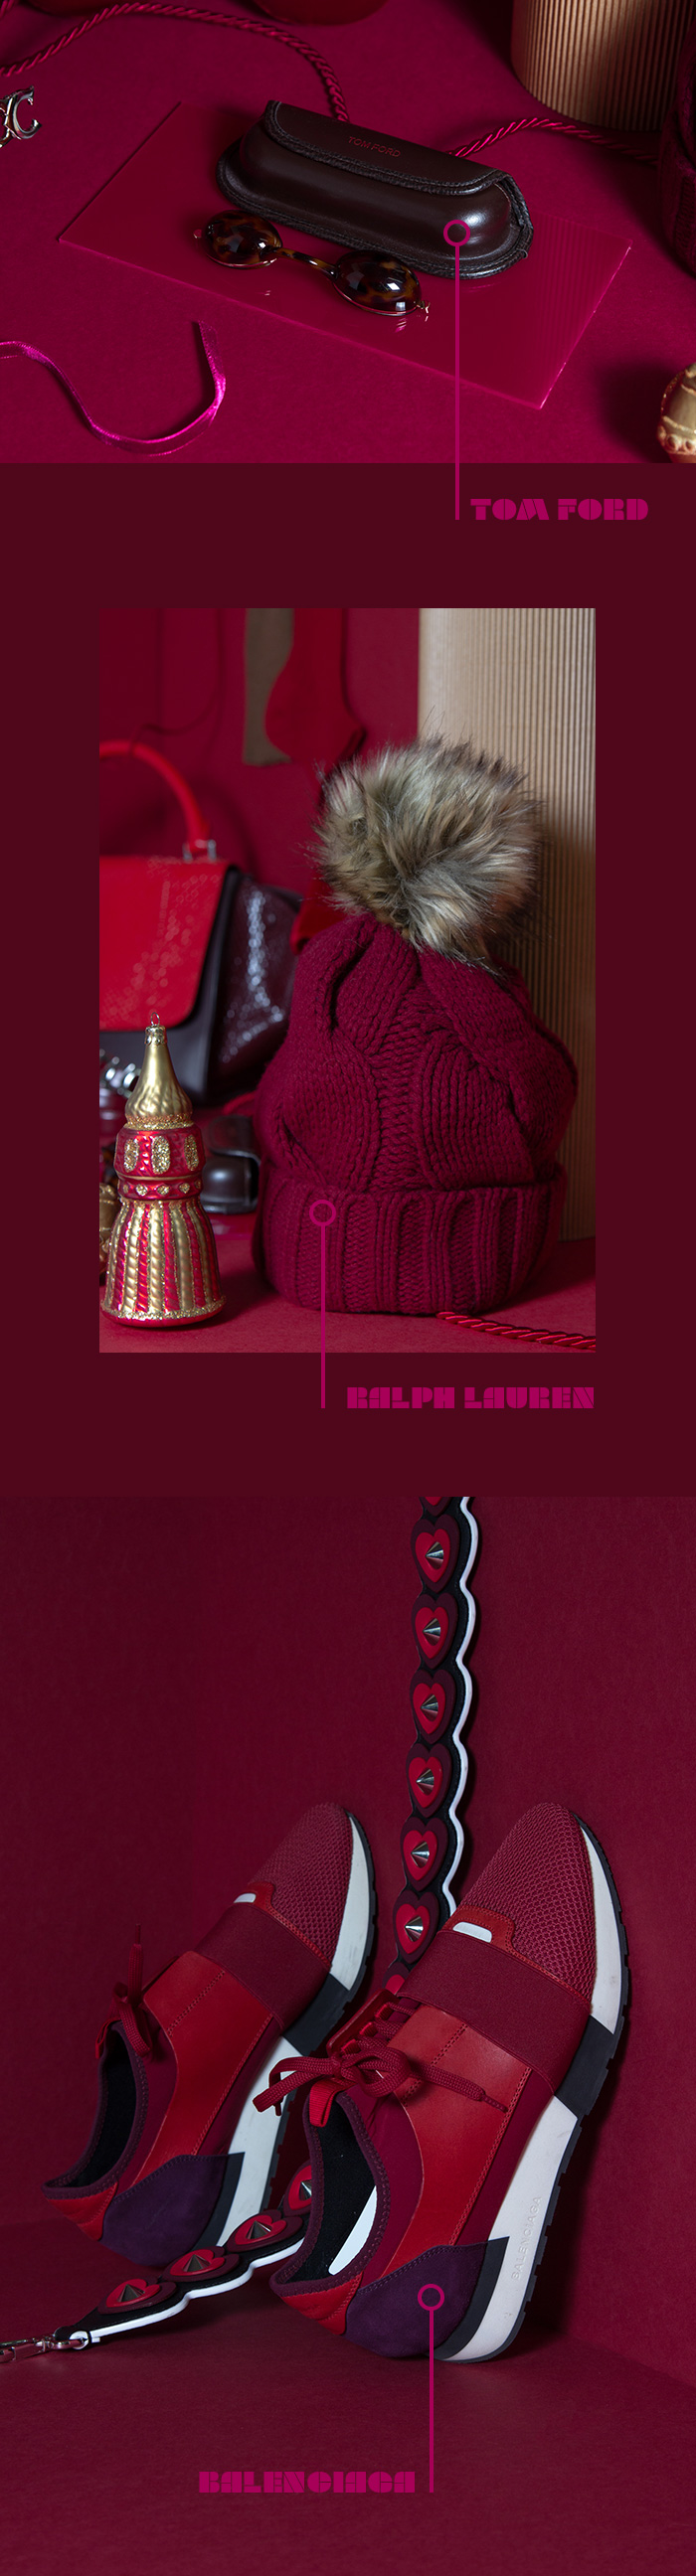 Geschenke-Guide Weihnachten 2019 - Tom Ford, Balenciaga, Ralph Lauren